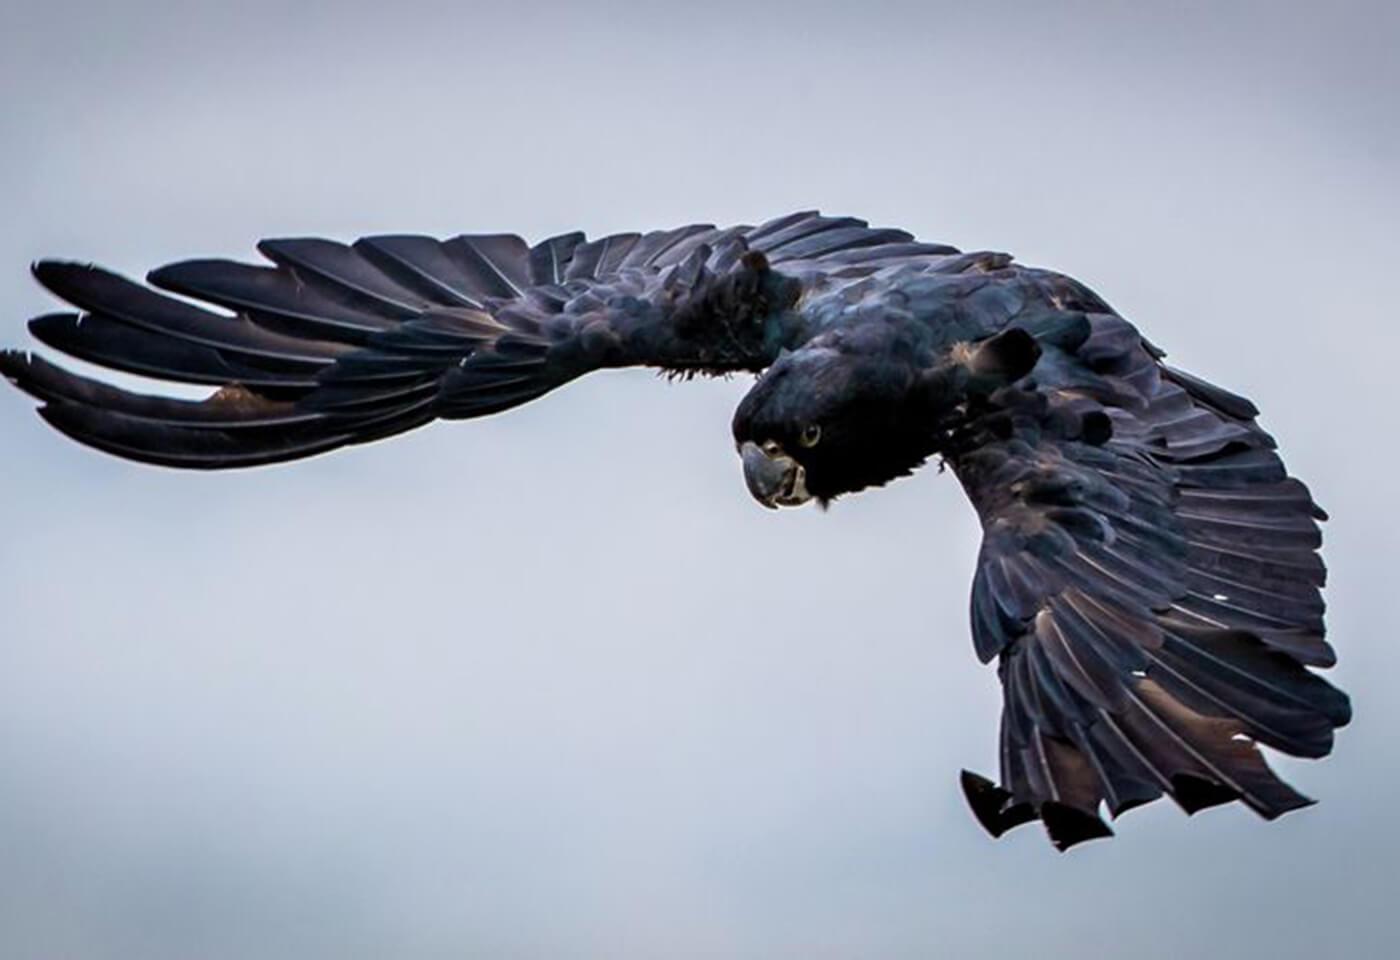 black bird wings spread flying